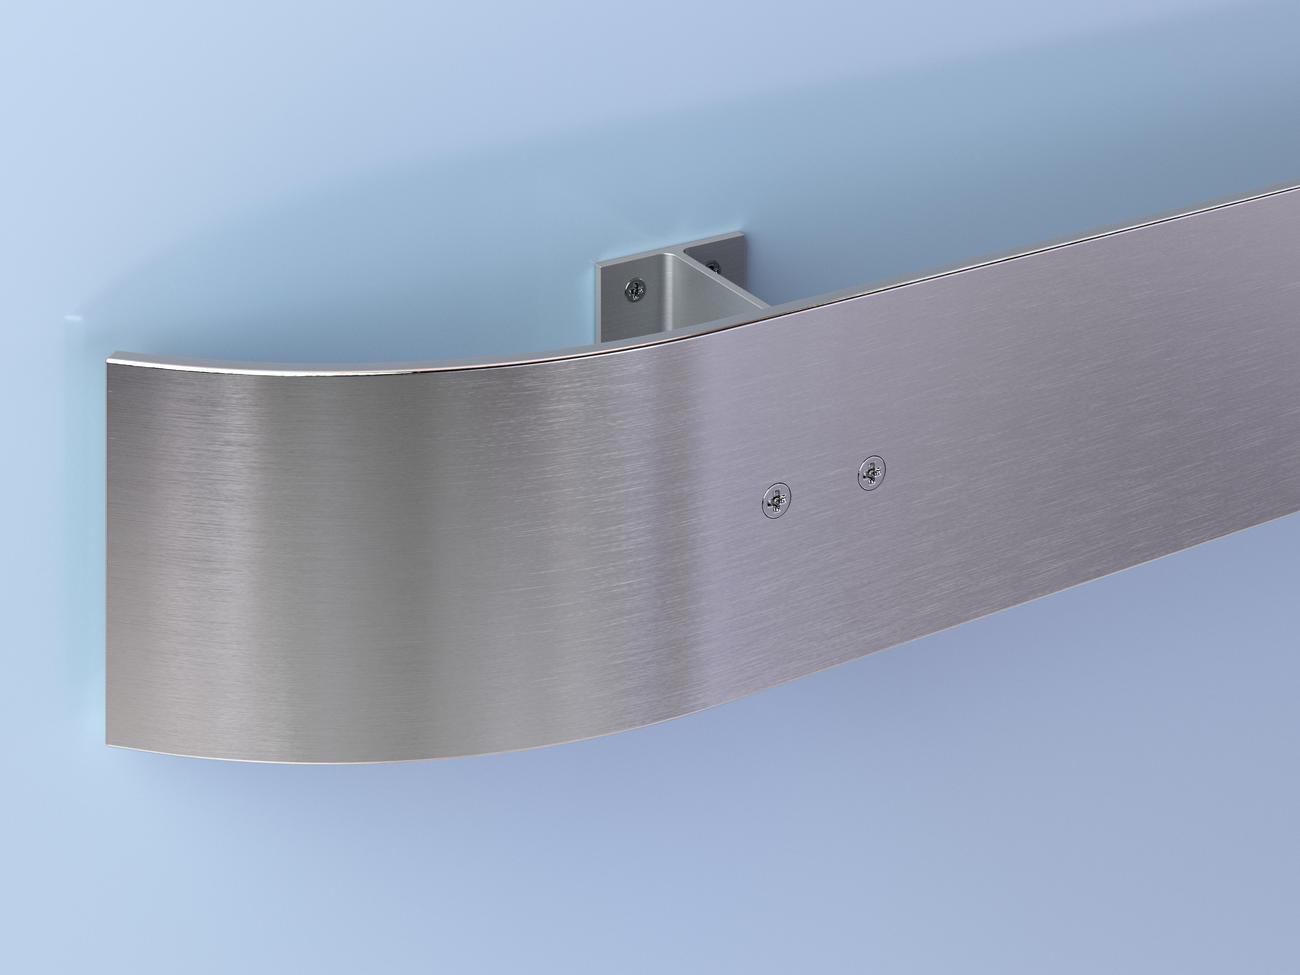 CRS-100 Stainless Steel Crash Rail